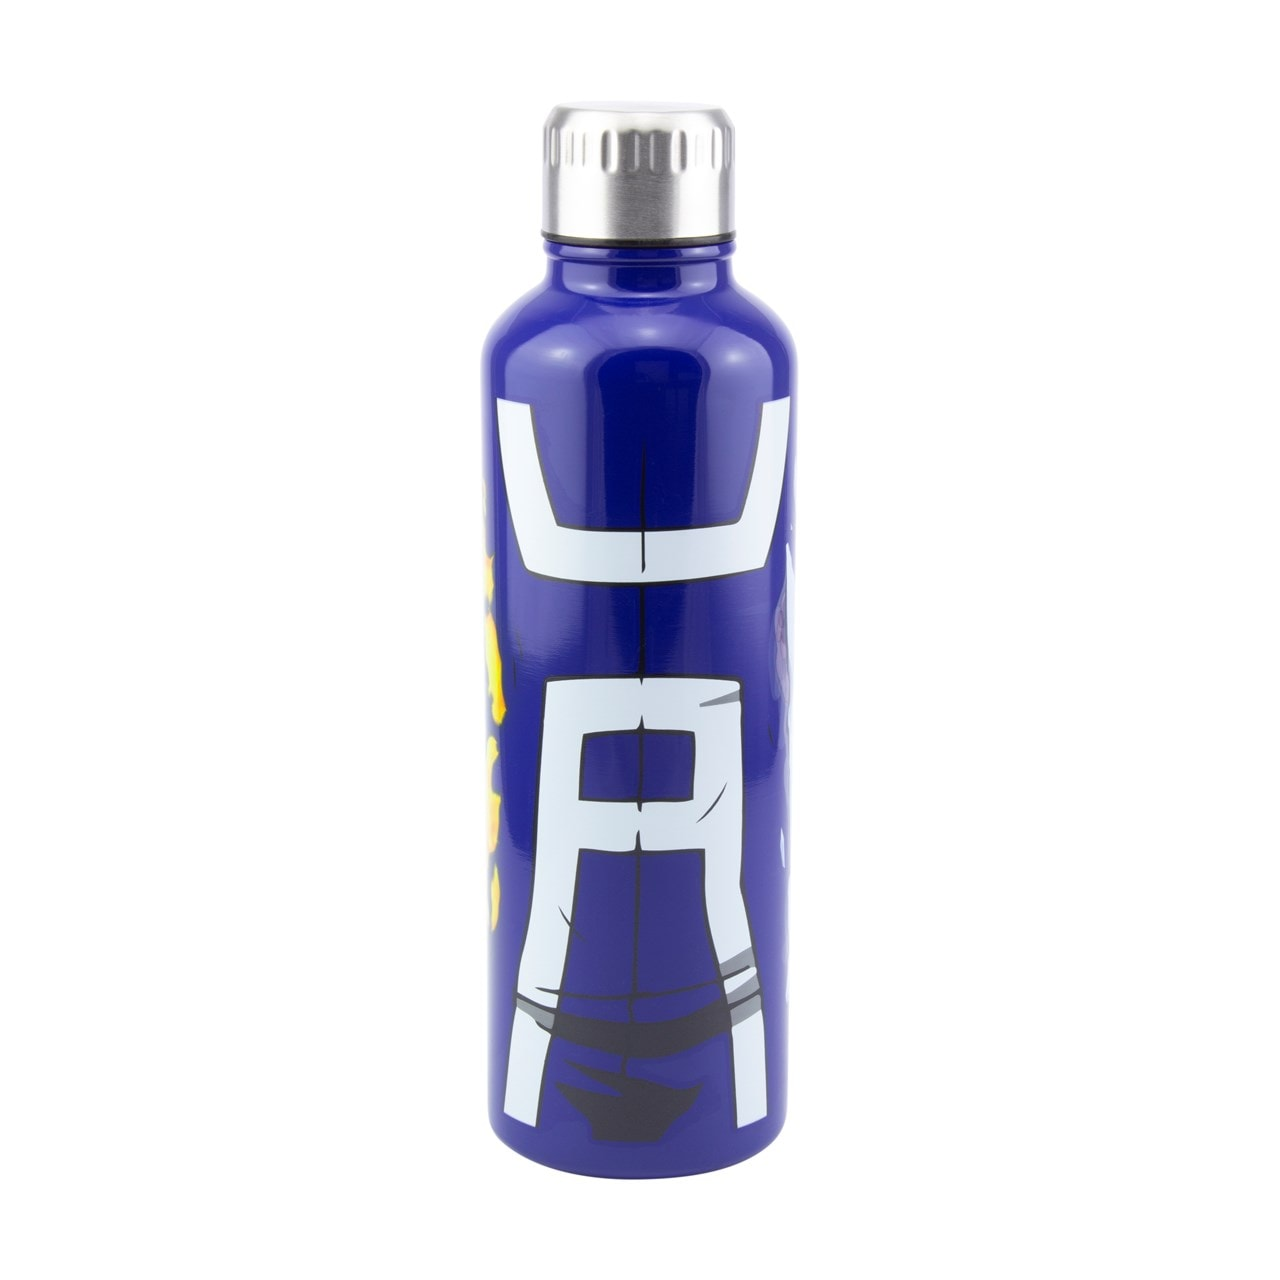 My Hero Academia Metal Water Bottle - 2